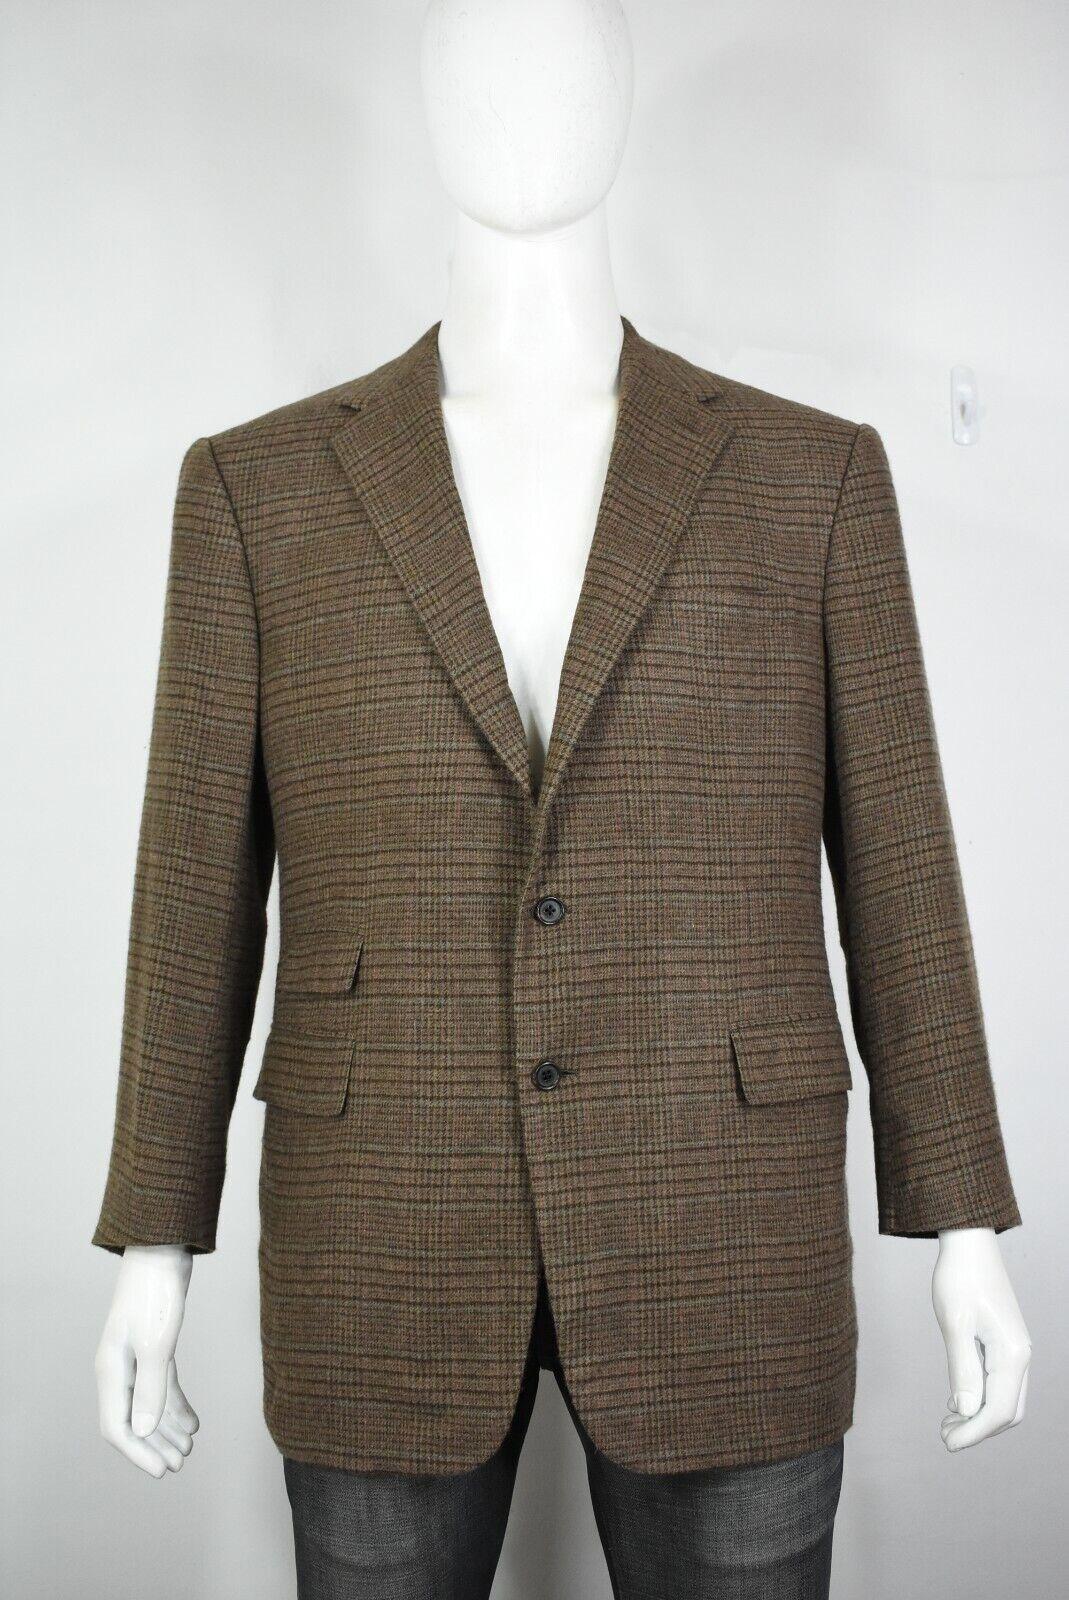 Ralph Lauren lila label cashmere blazer 44 R jacke check plaid braun